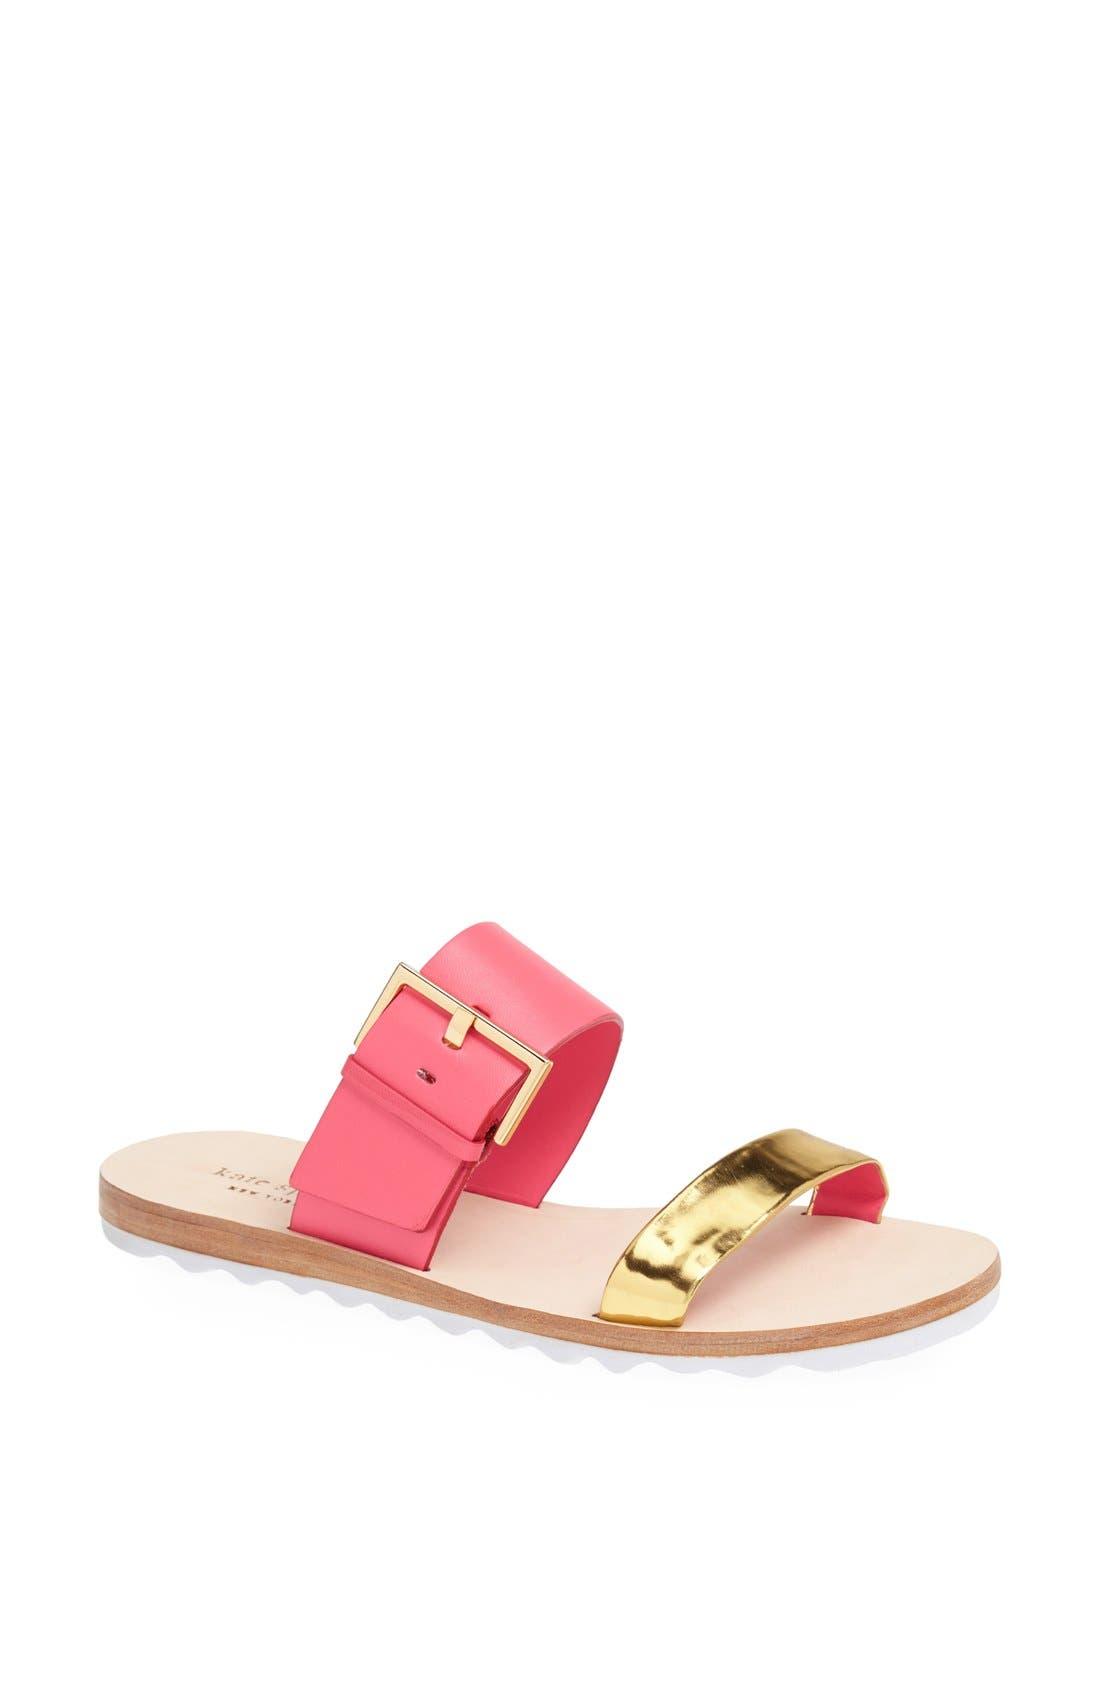 Main Image - kate spade new york 'attitude' slide sandal